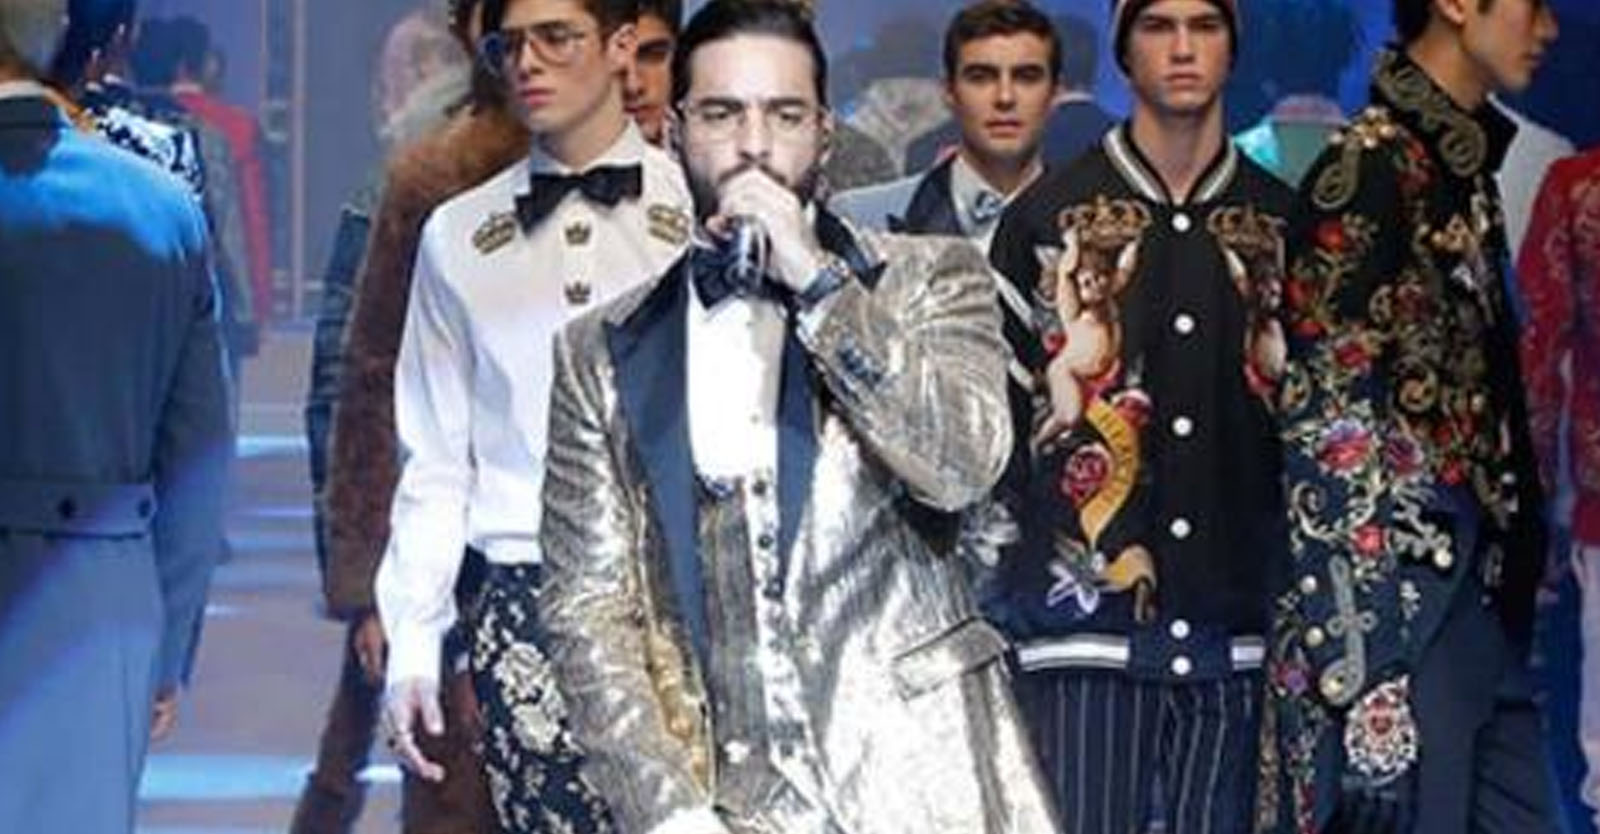 dc0507aff4 Este sábado se realizó la pasarela Menswear de Dolce & Gabbana en Milán ...